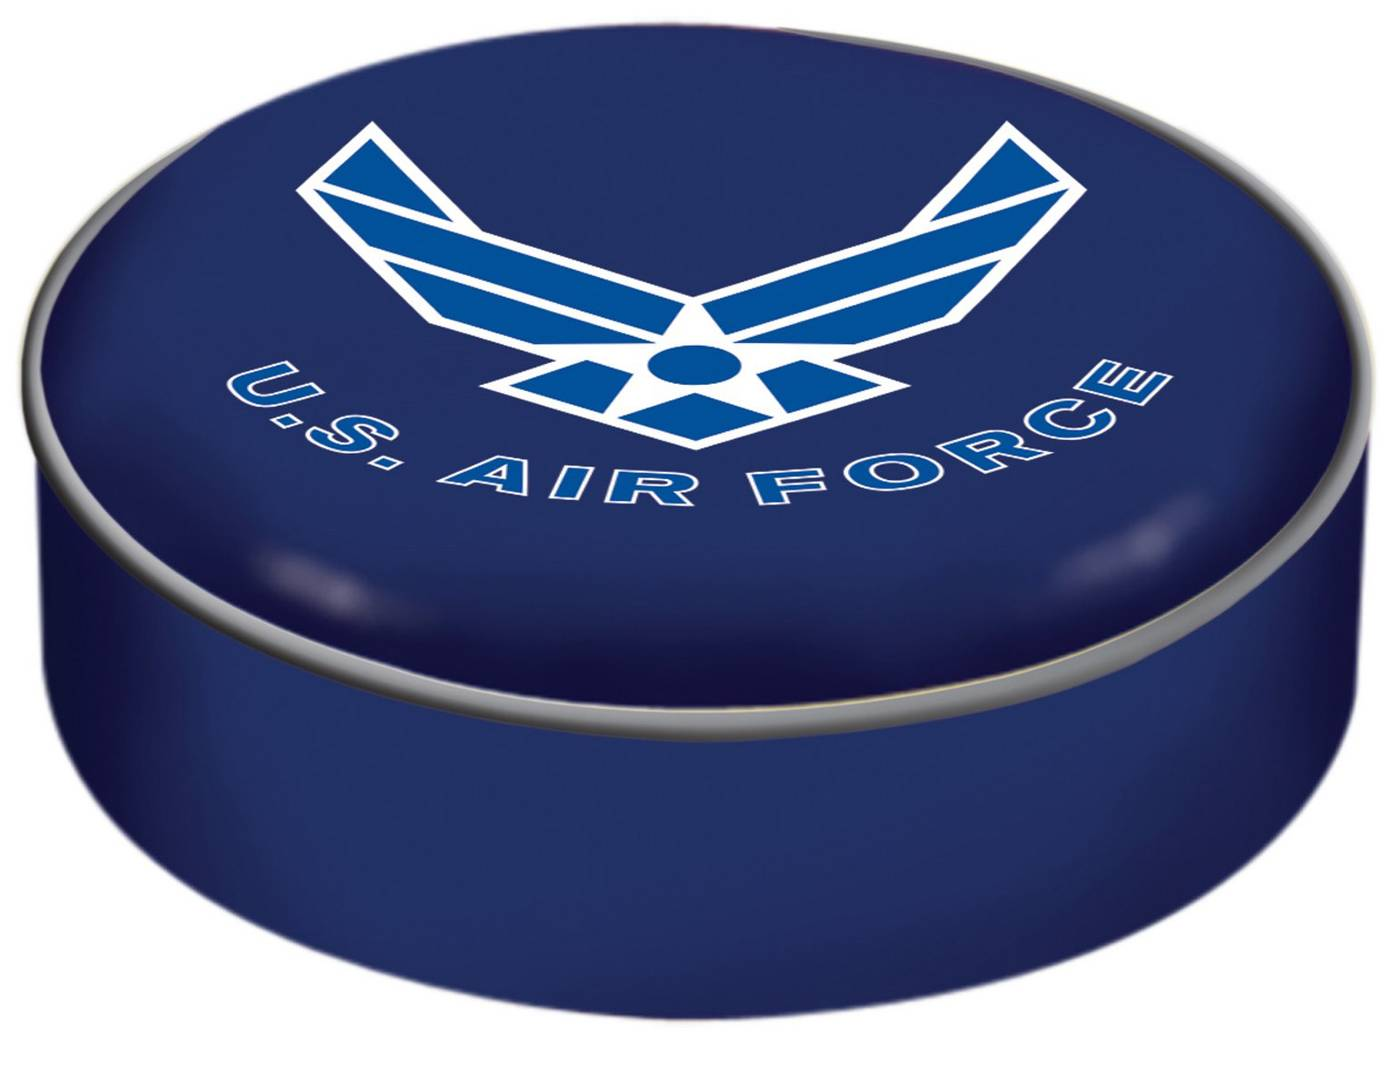 Air Force Falcons Bar Stool Seat Cover : air force falcons bar stool seat covermainProductImageFullSize from www.sportsunlimitedinc.com size 960 x 800 jpeg 55kB